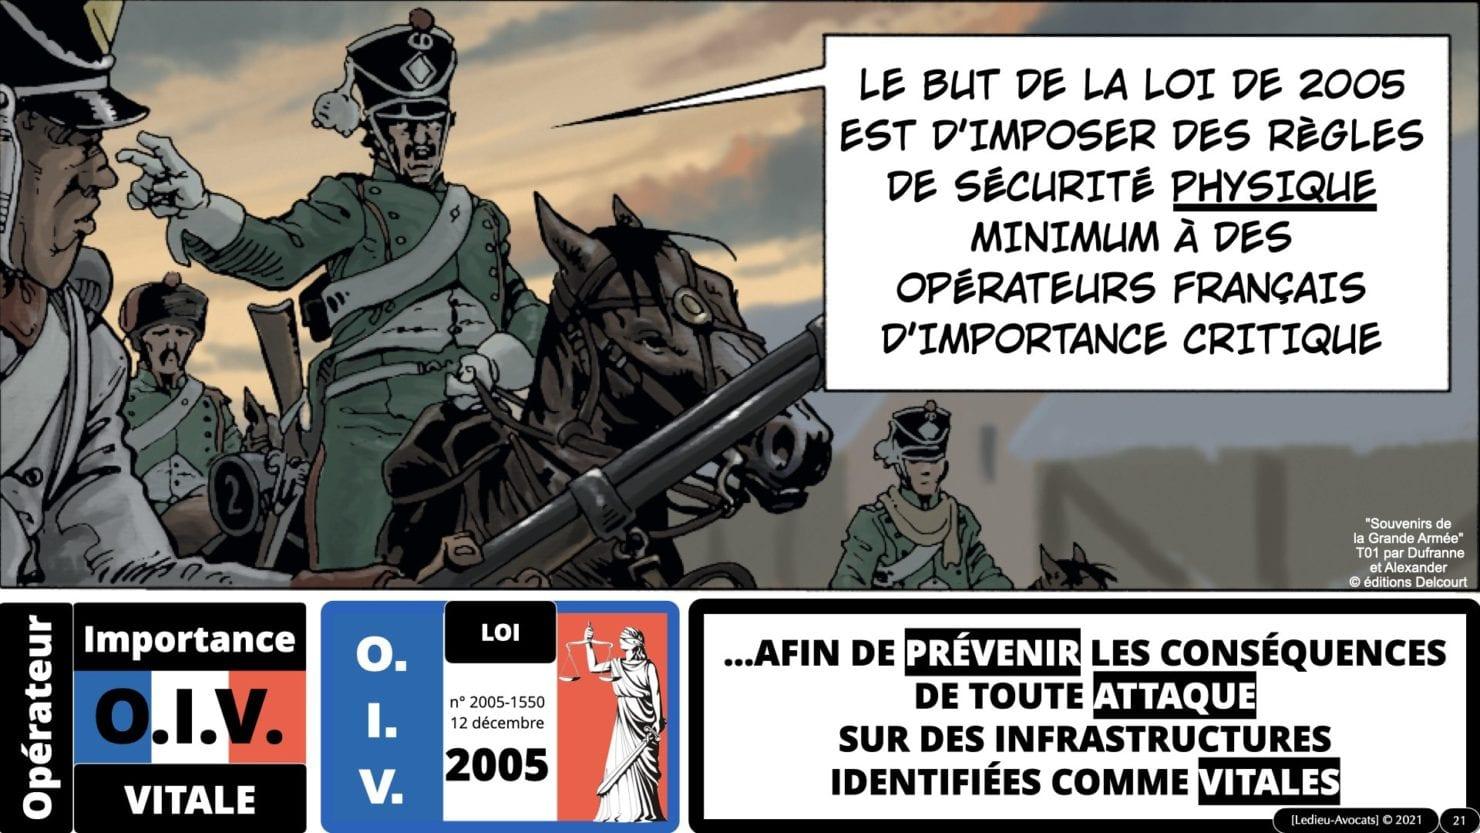 337 cyber sécurité #1 OIV OSE Critical Entities © Ledieu-avocat 15-06-2021.021